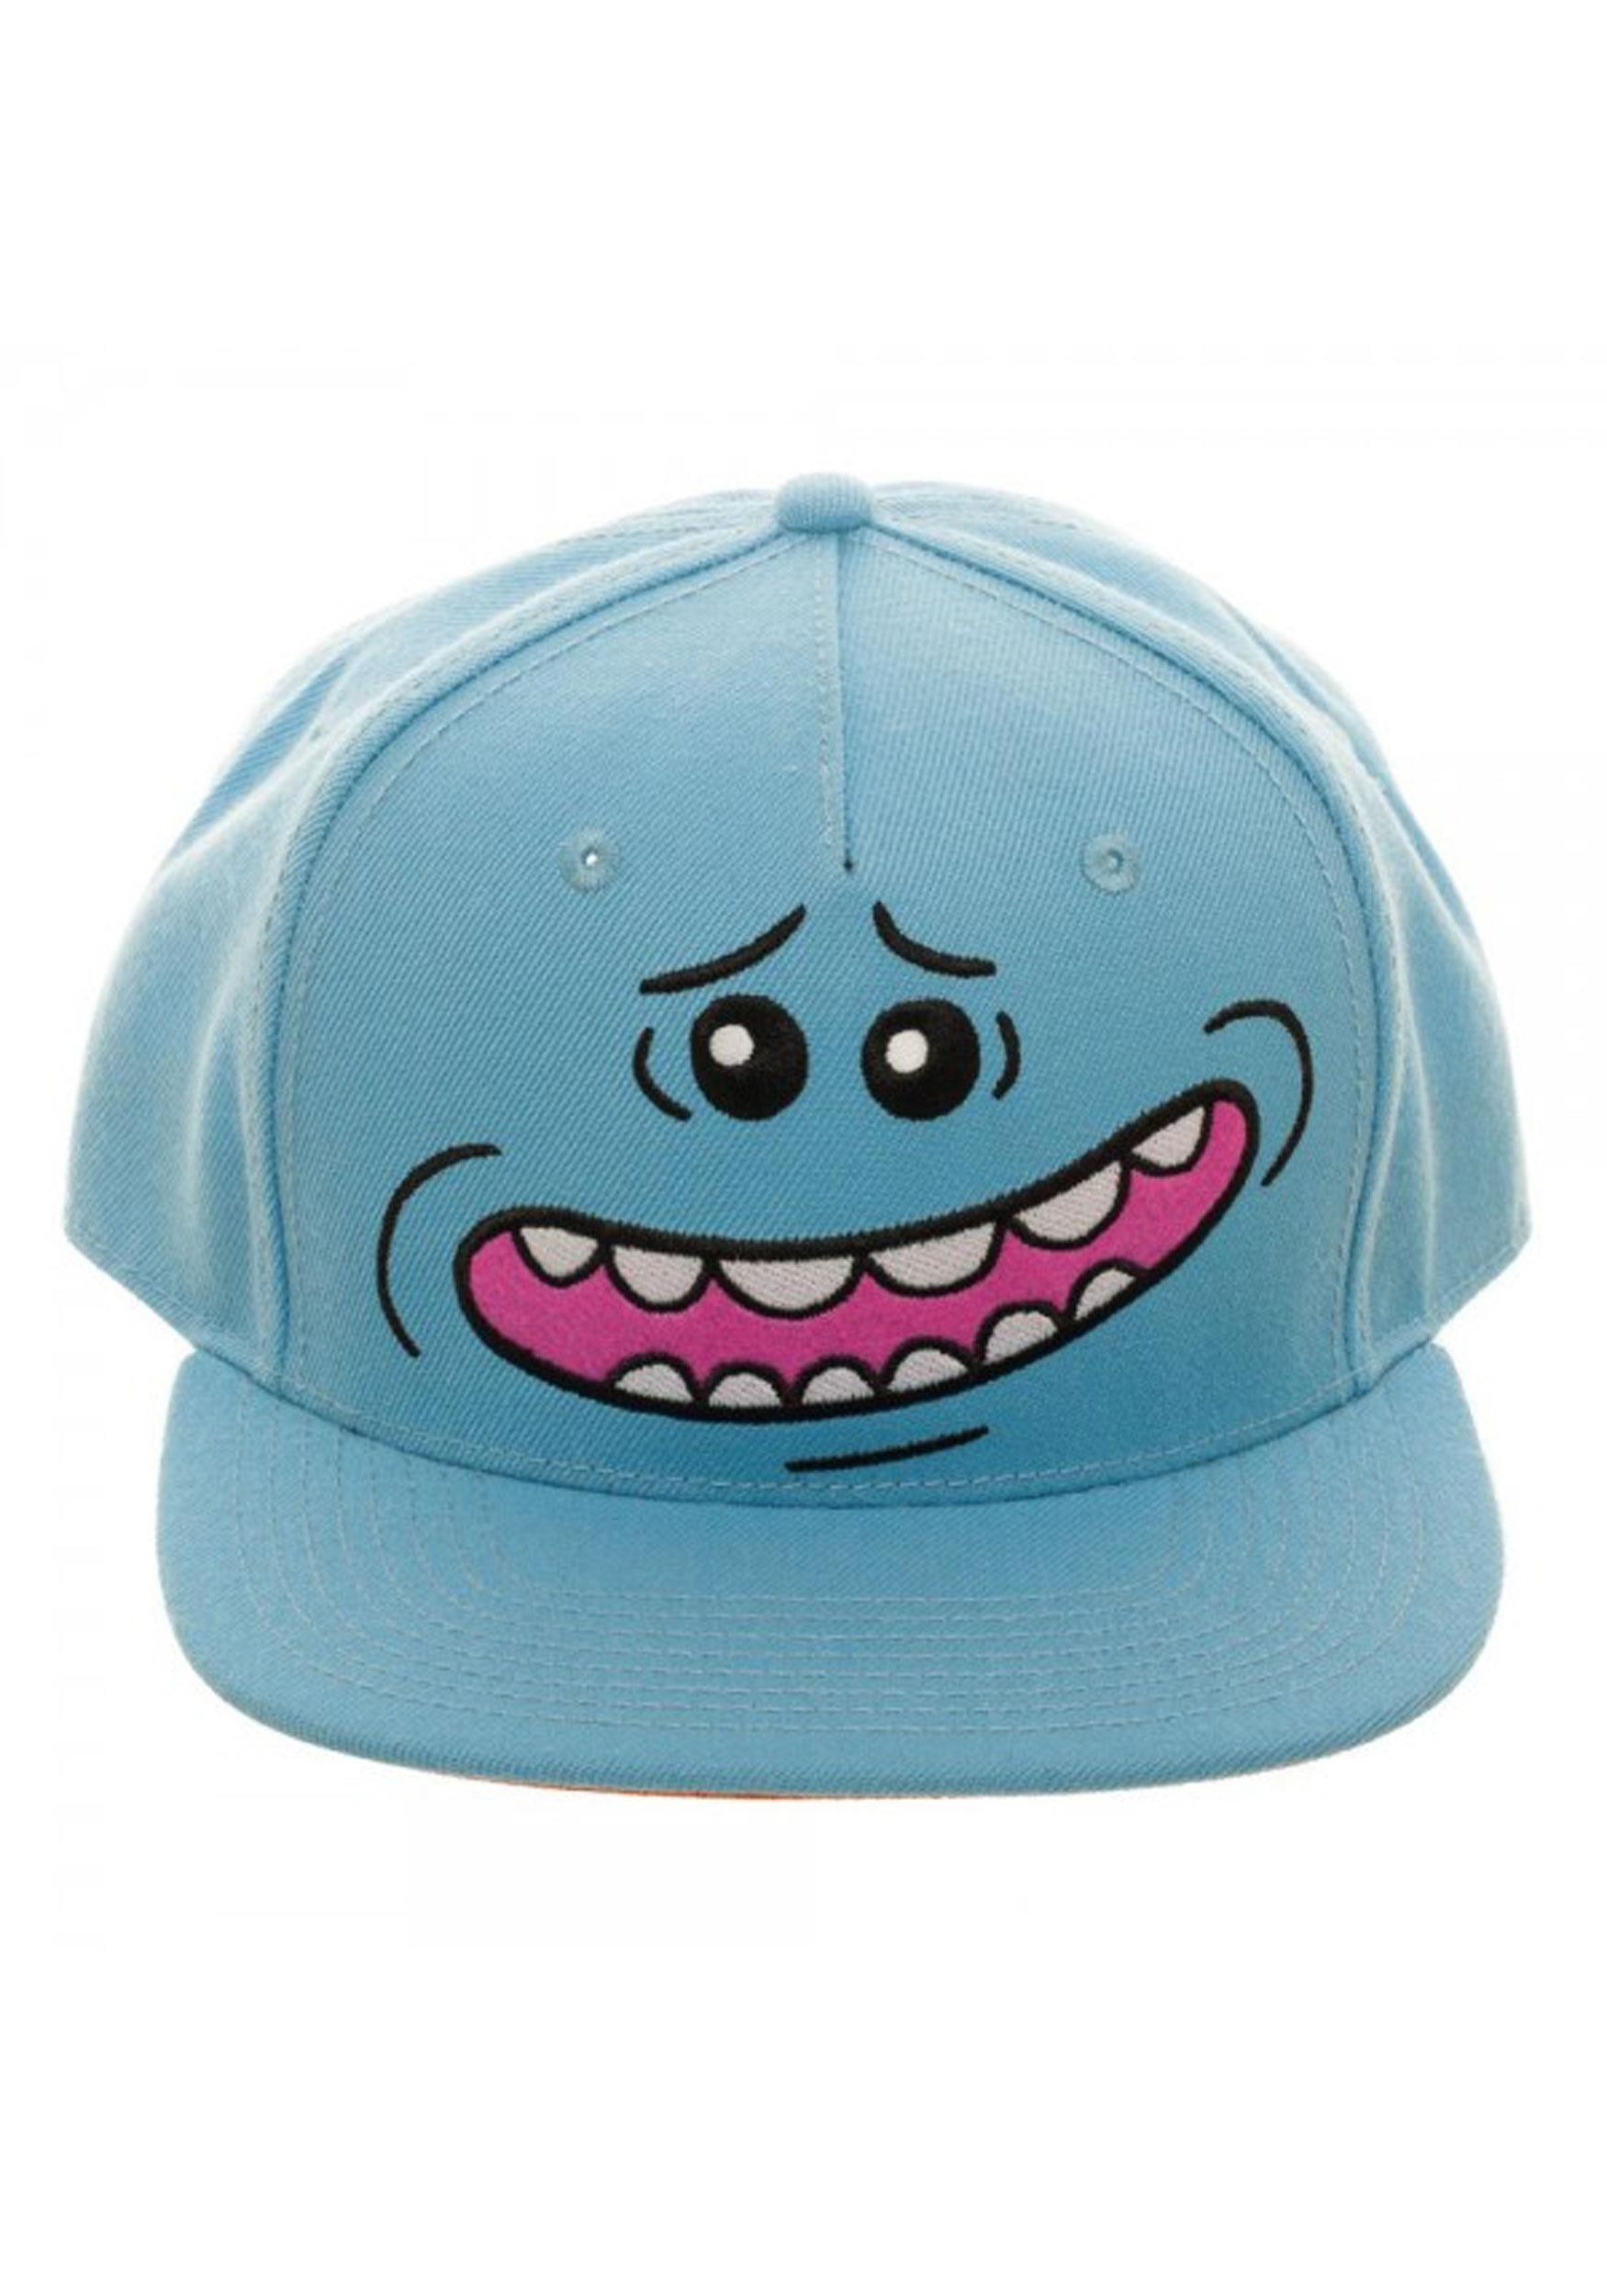 b9c76d4cd36f8 The Rick and Morty Mr. Meeseeks Big Face Snapback Hat